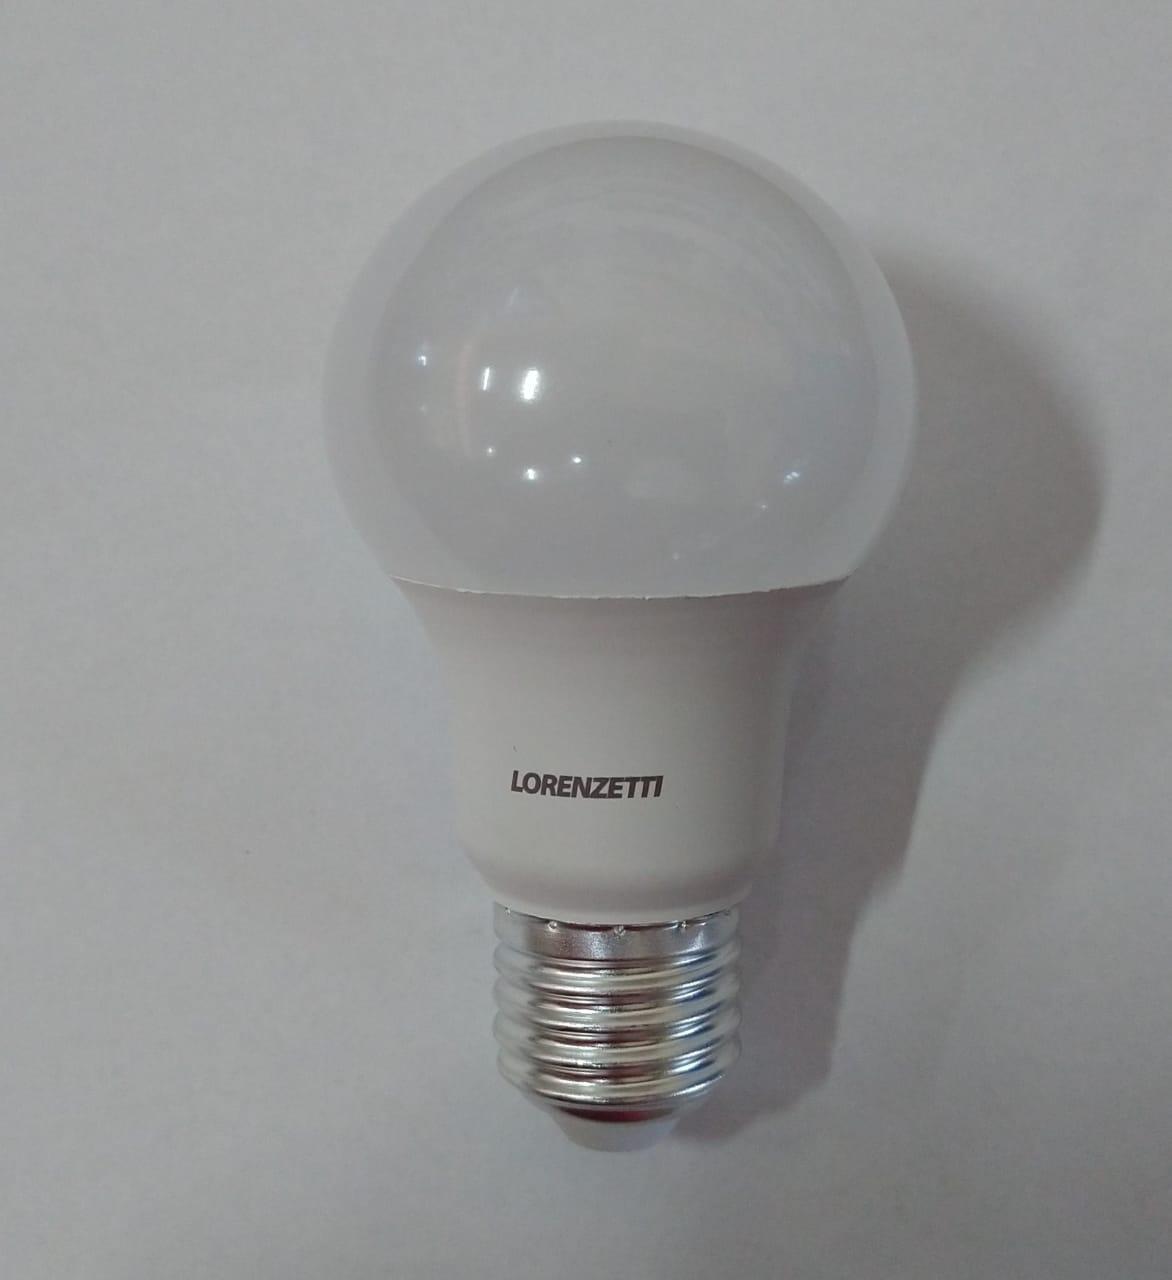 KIT 10 LAMPADAS LED BULBO 9W BRANCA BIVOLT LORENZETTI